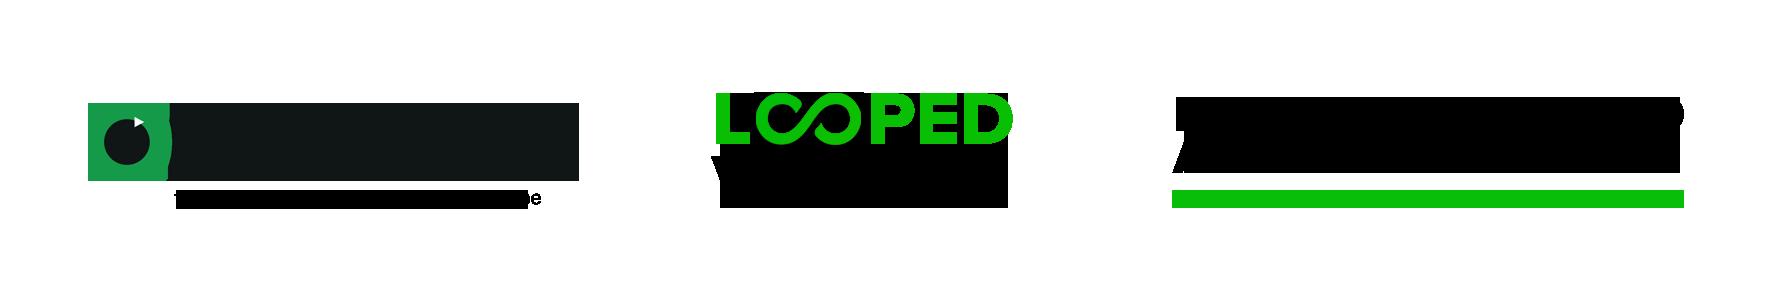 EDM VJ Loops Bundle Vol 1 ⭐️⭐️⭐️⭐️⭐️ - LIME ART GROUP Shop